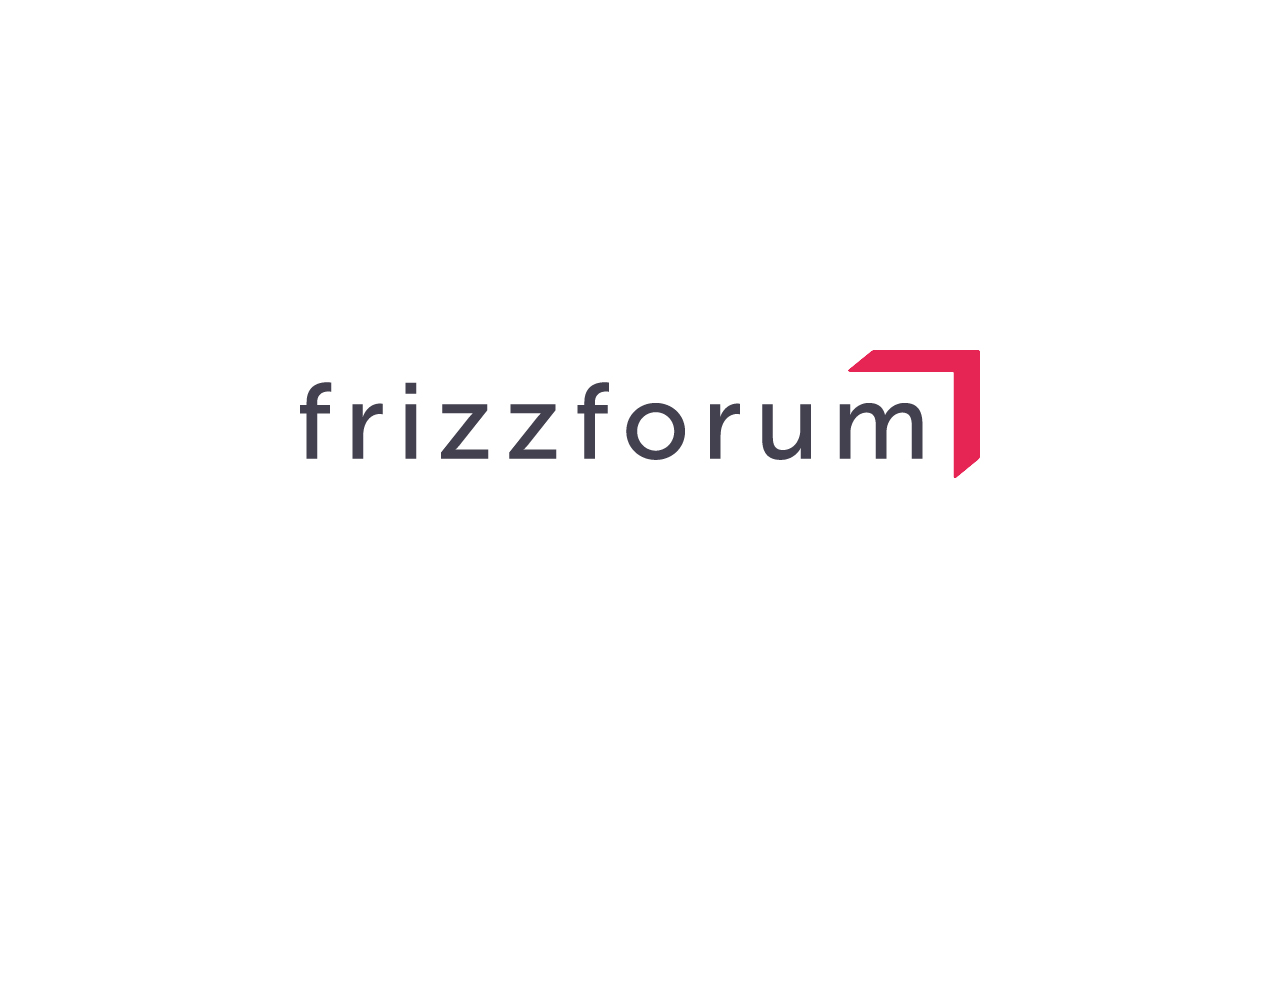 Caroline-Rismont-Frizzforum-Logo